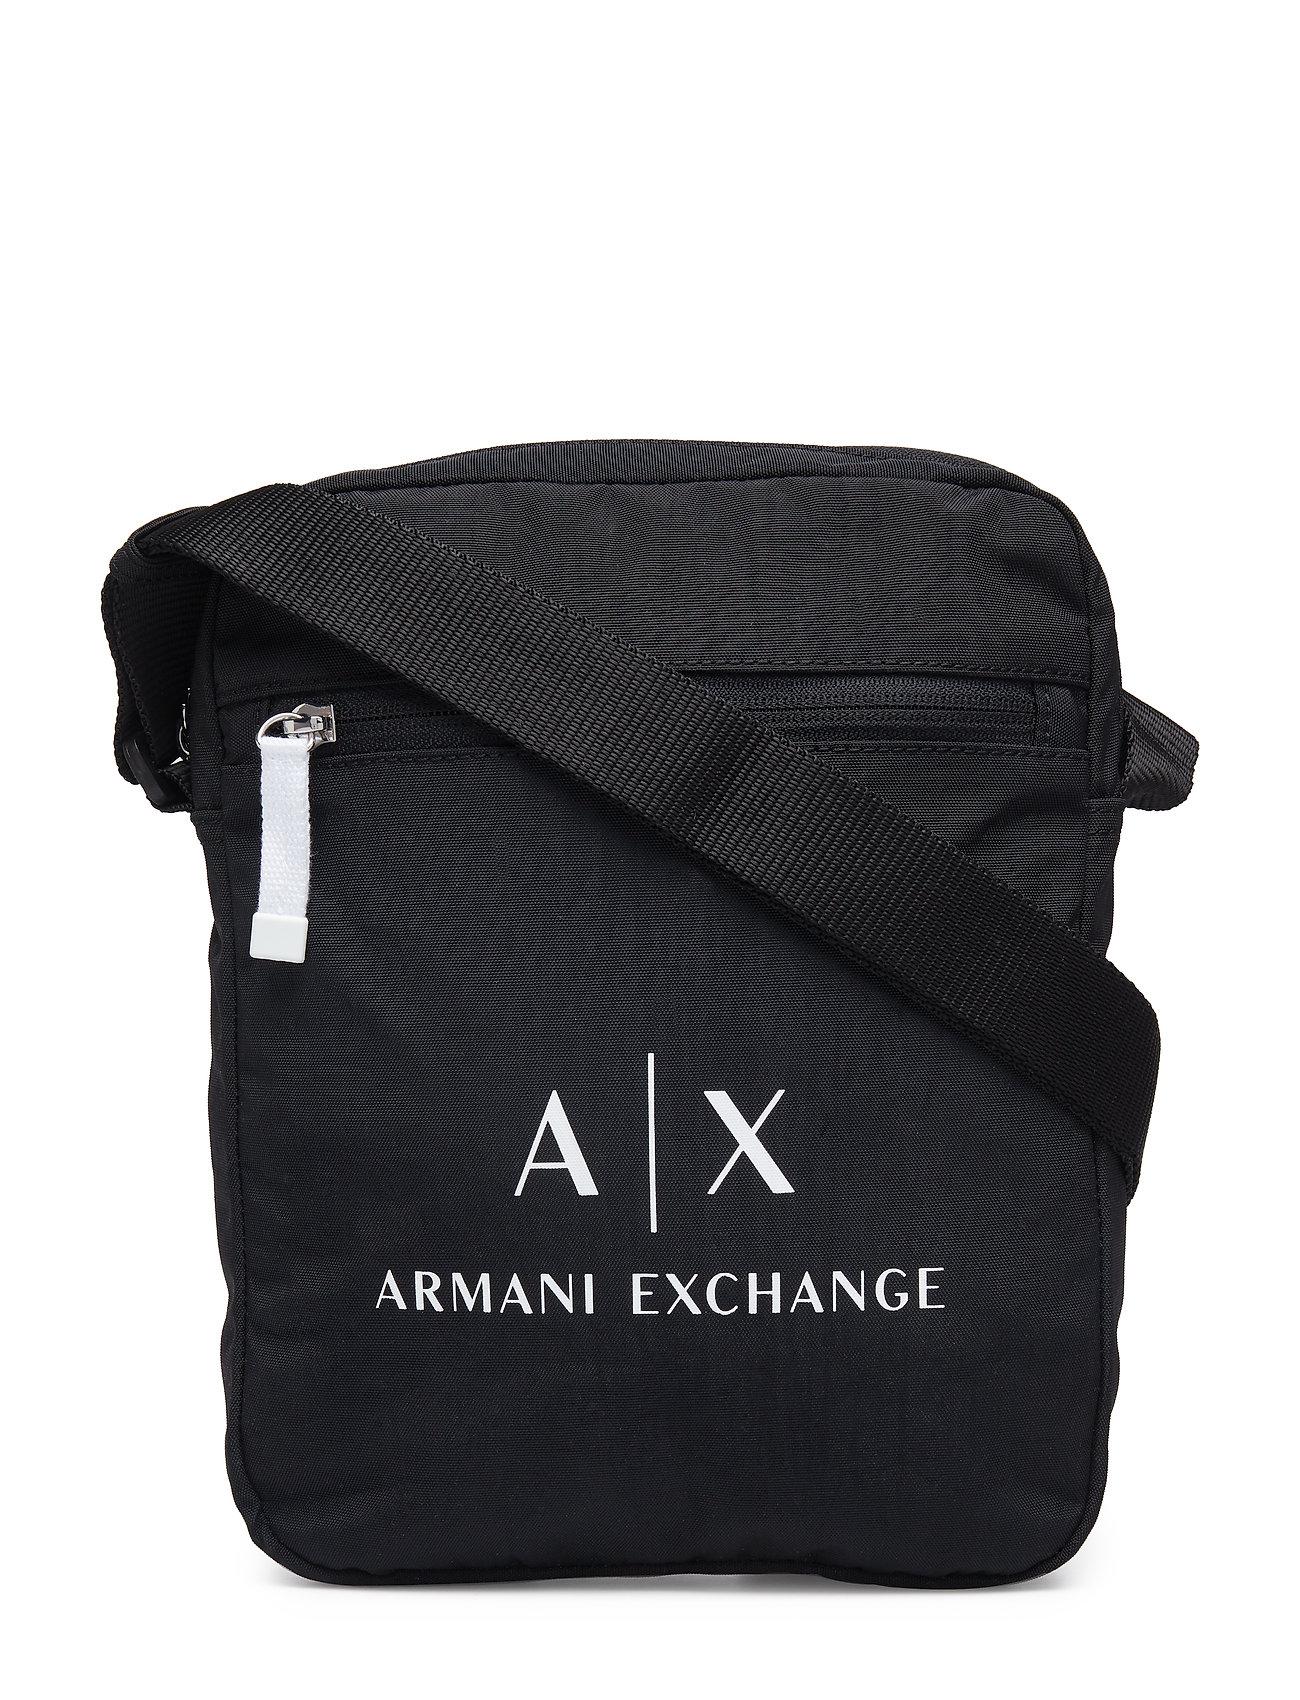 Armani Exchange MAN WOVEN MESSENGER BAG